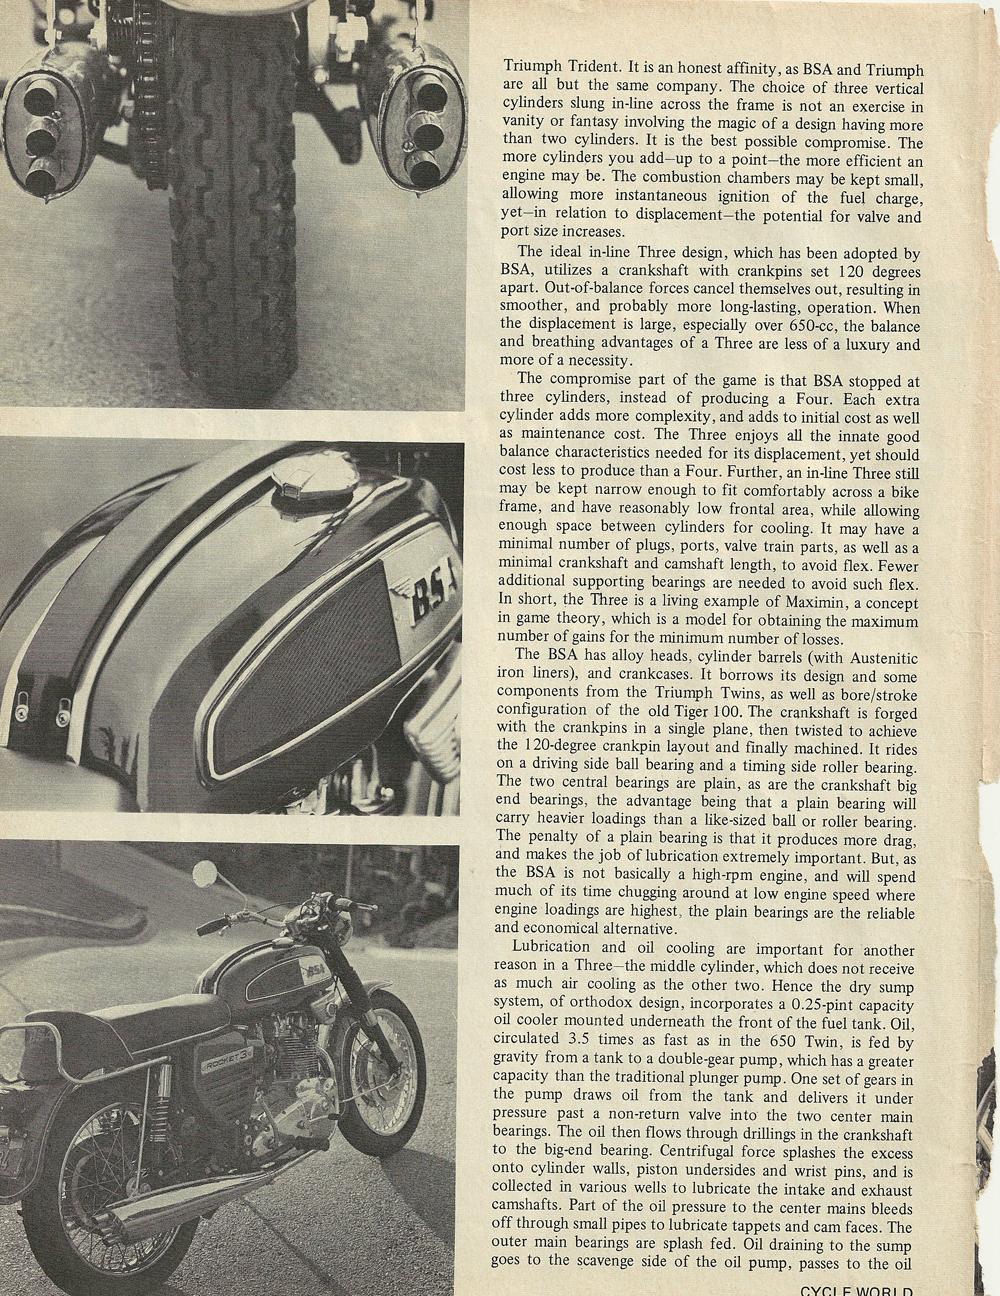 1969 BSA Rocket 3 road test 3.jpg